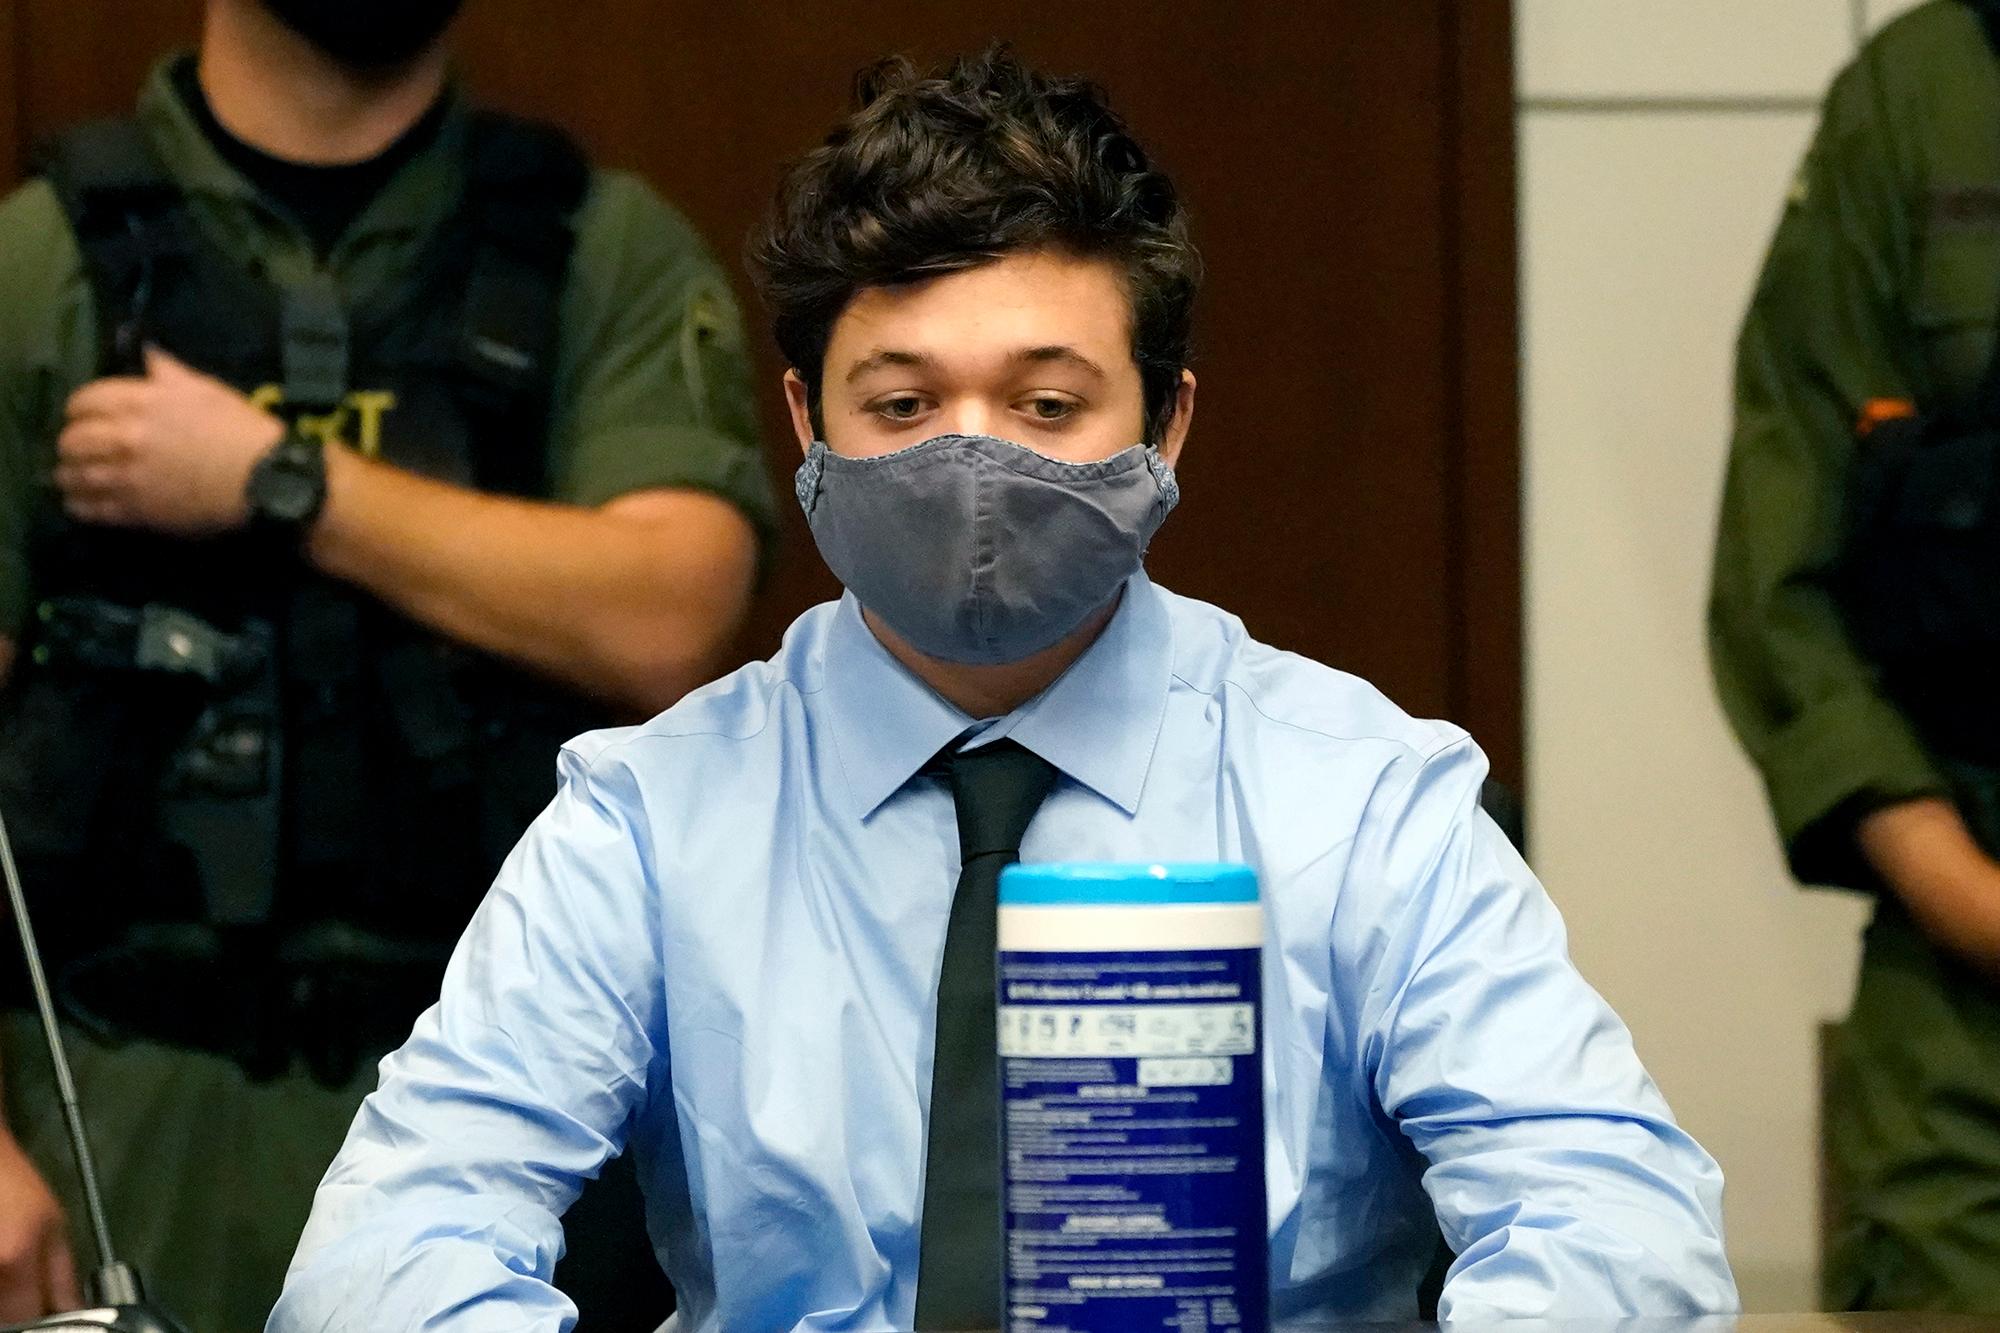 Kenosha murder suspect Kyle Rittenhouse posts  million bond, no longer in custody